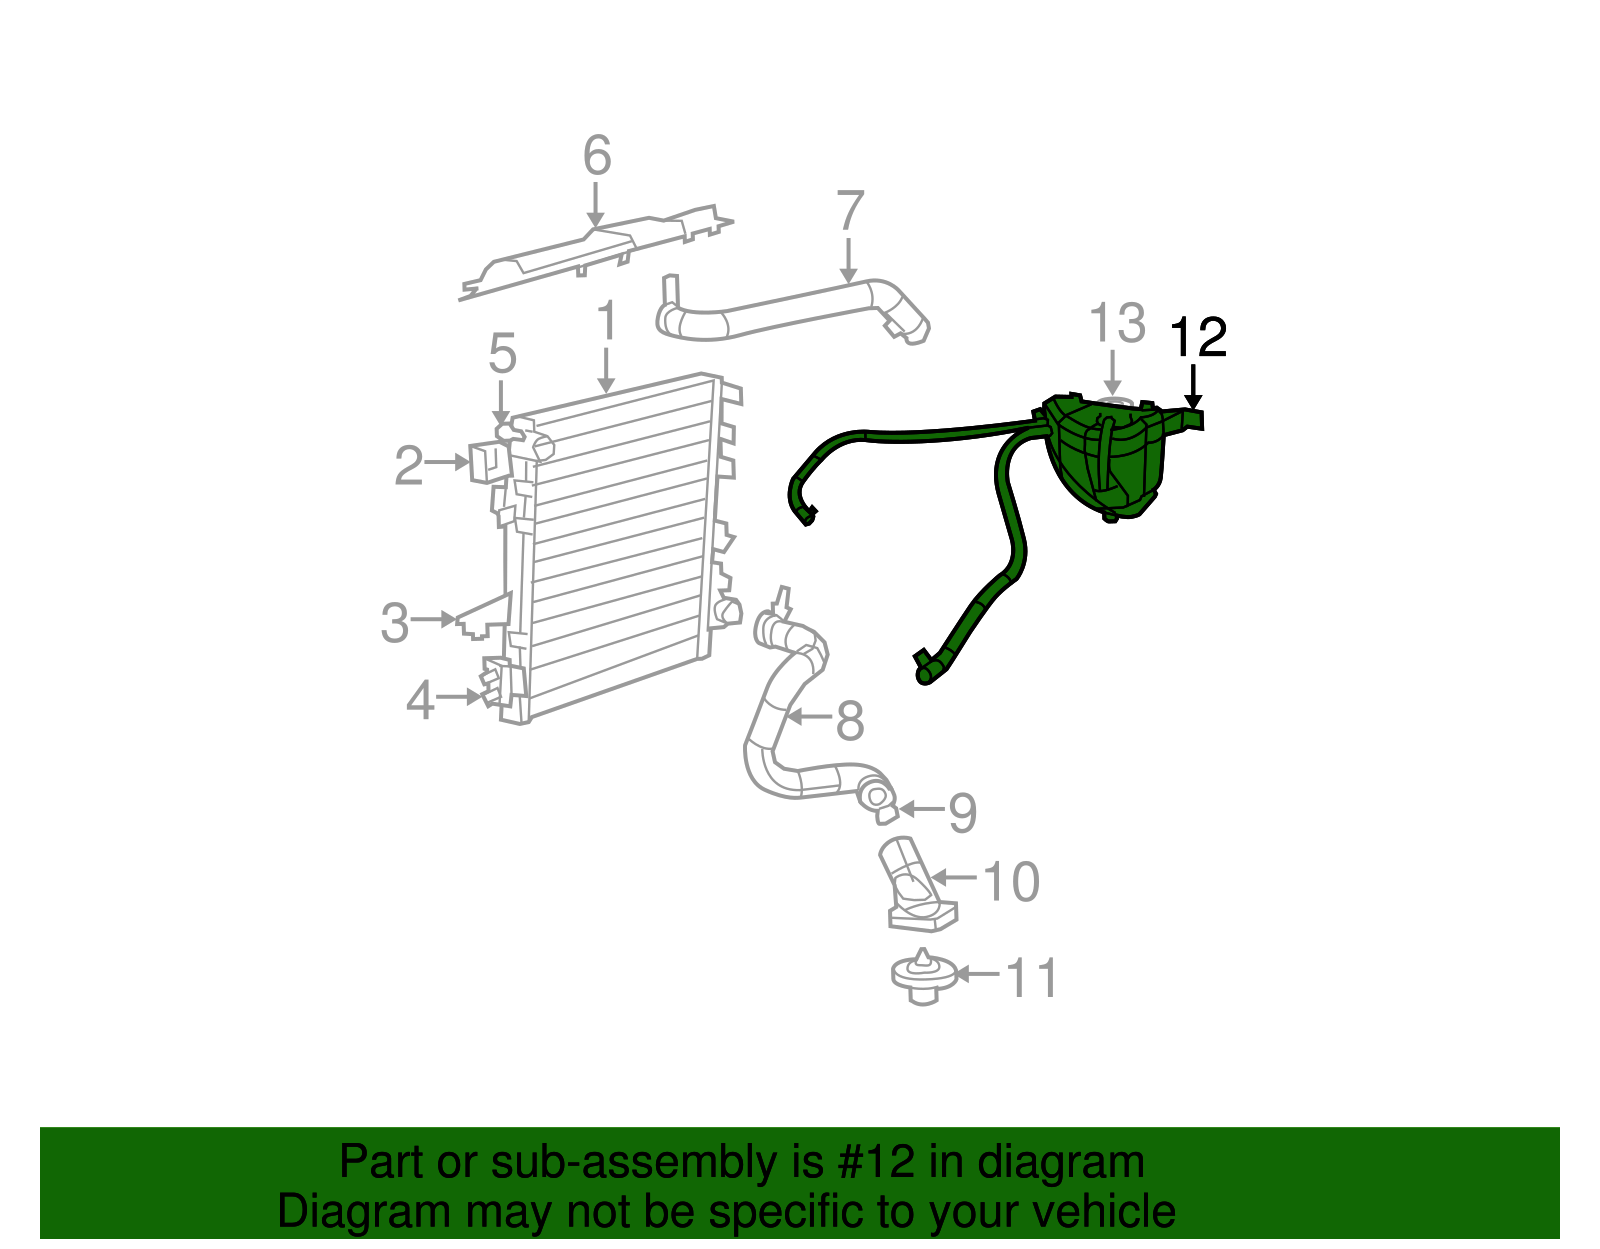 Engine Coolant Recovery Tank Mopar 55056542ae Fits 07 11 Jeep Wrangler Radiator Overflow Stock Photo